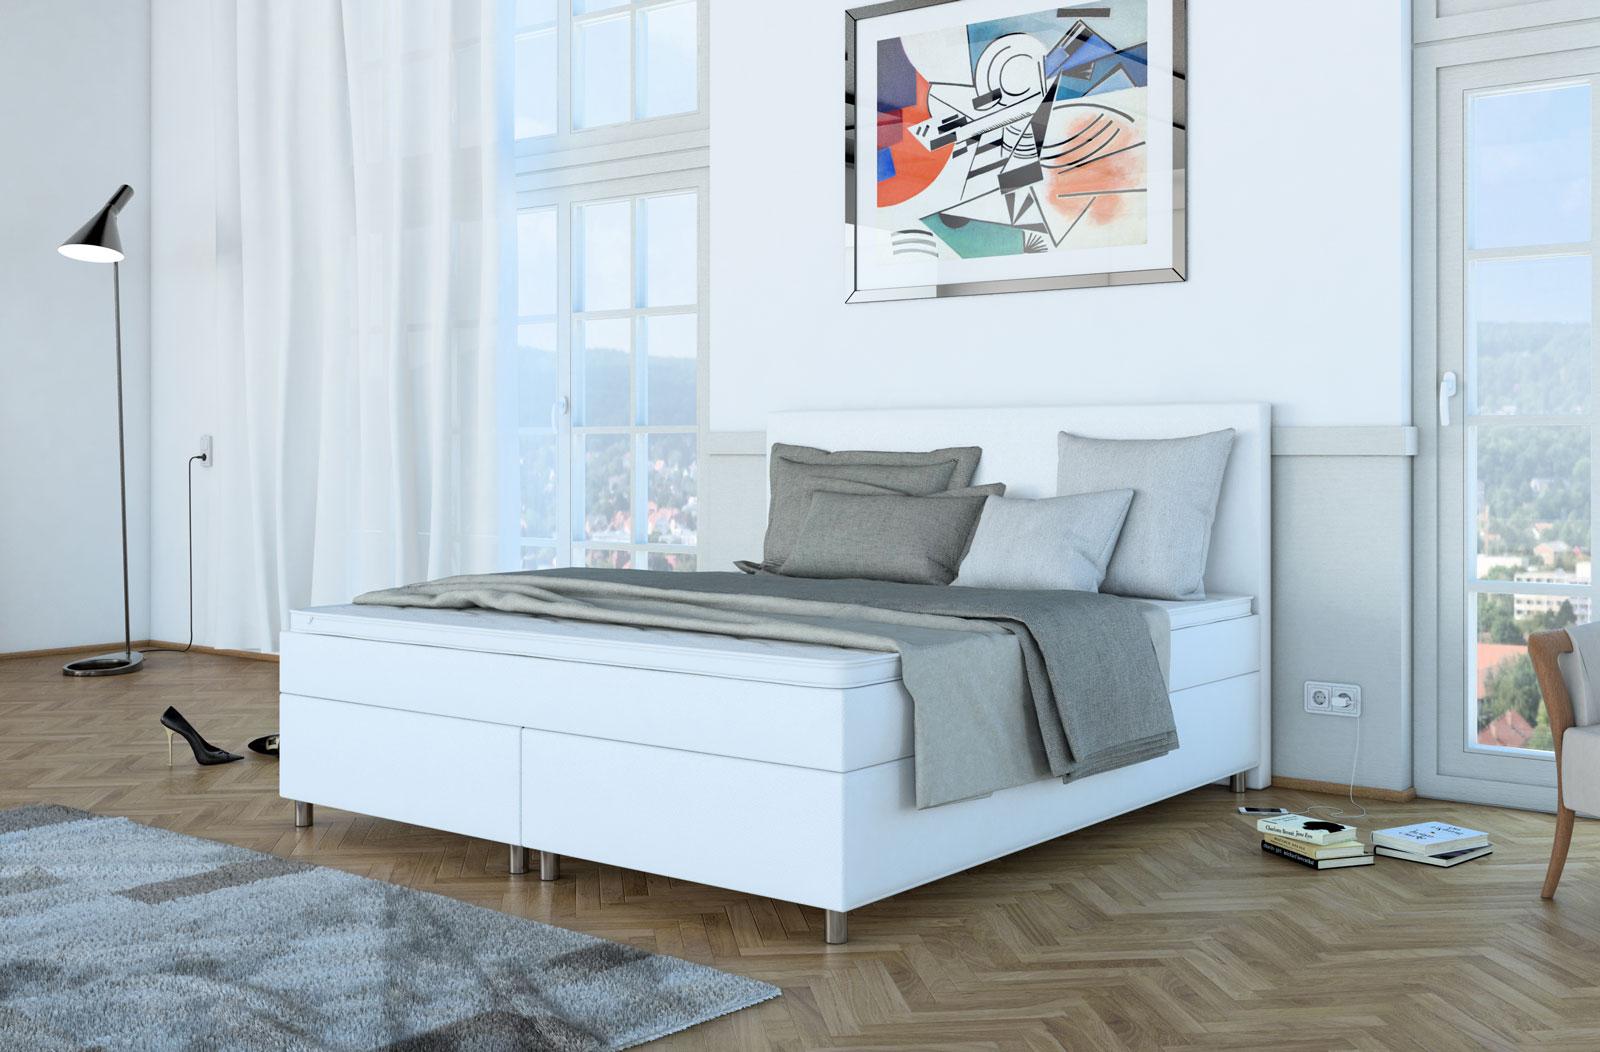 SAM® Boxspringbett Hotelbett 180 x 200 cm weiß NEO Demnächst !